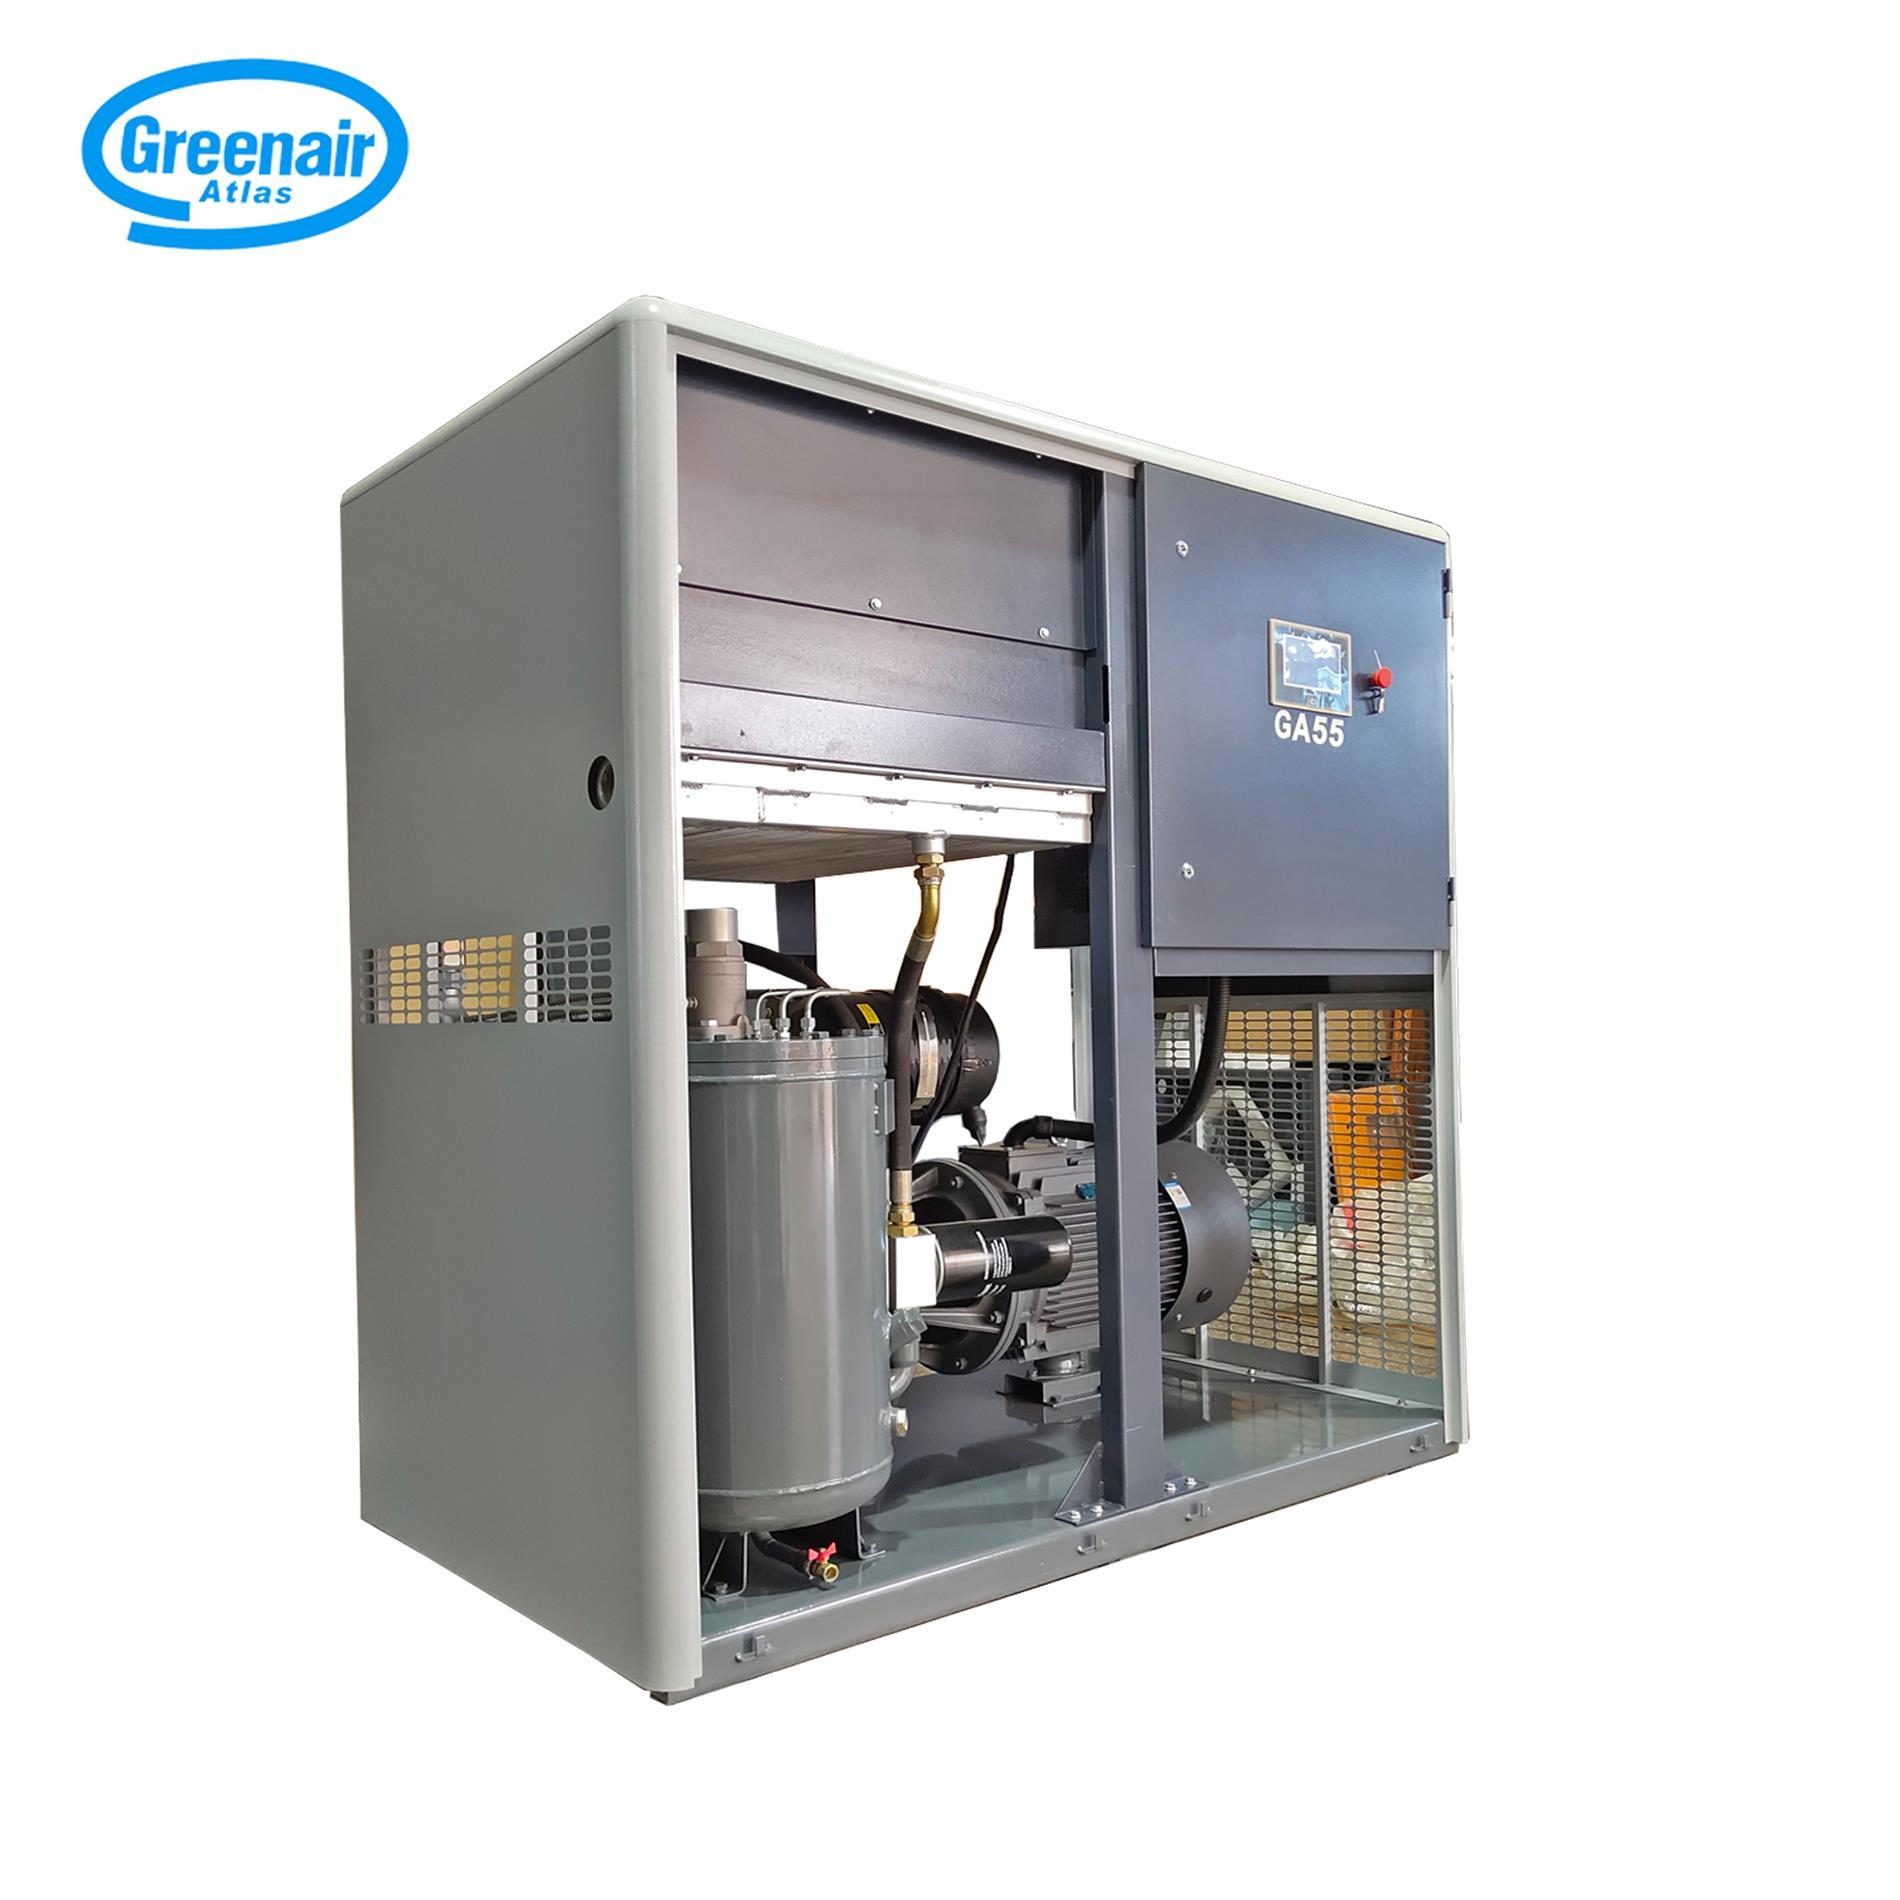 Greenair Atlas GA55 Electric Stationary Oil Injected Screw Air Compressor